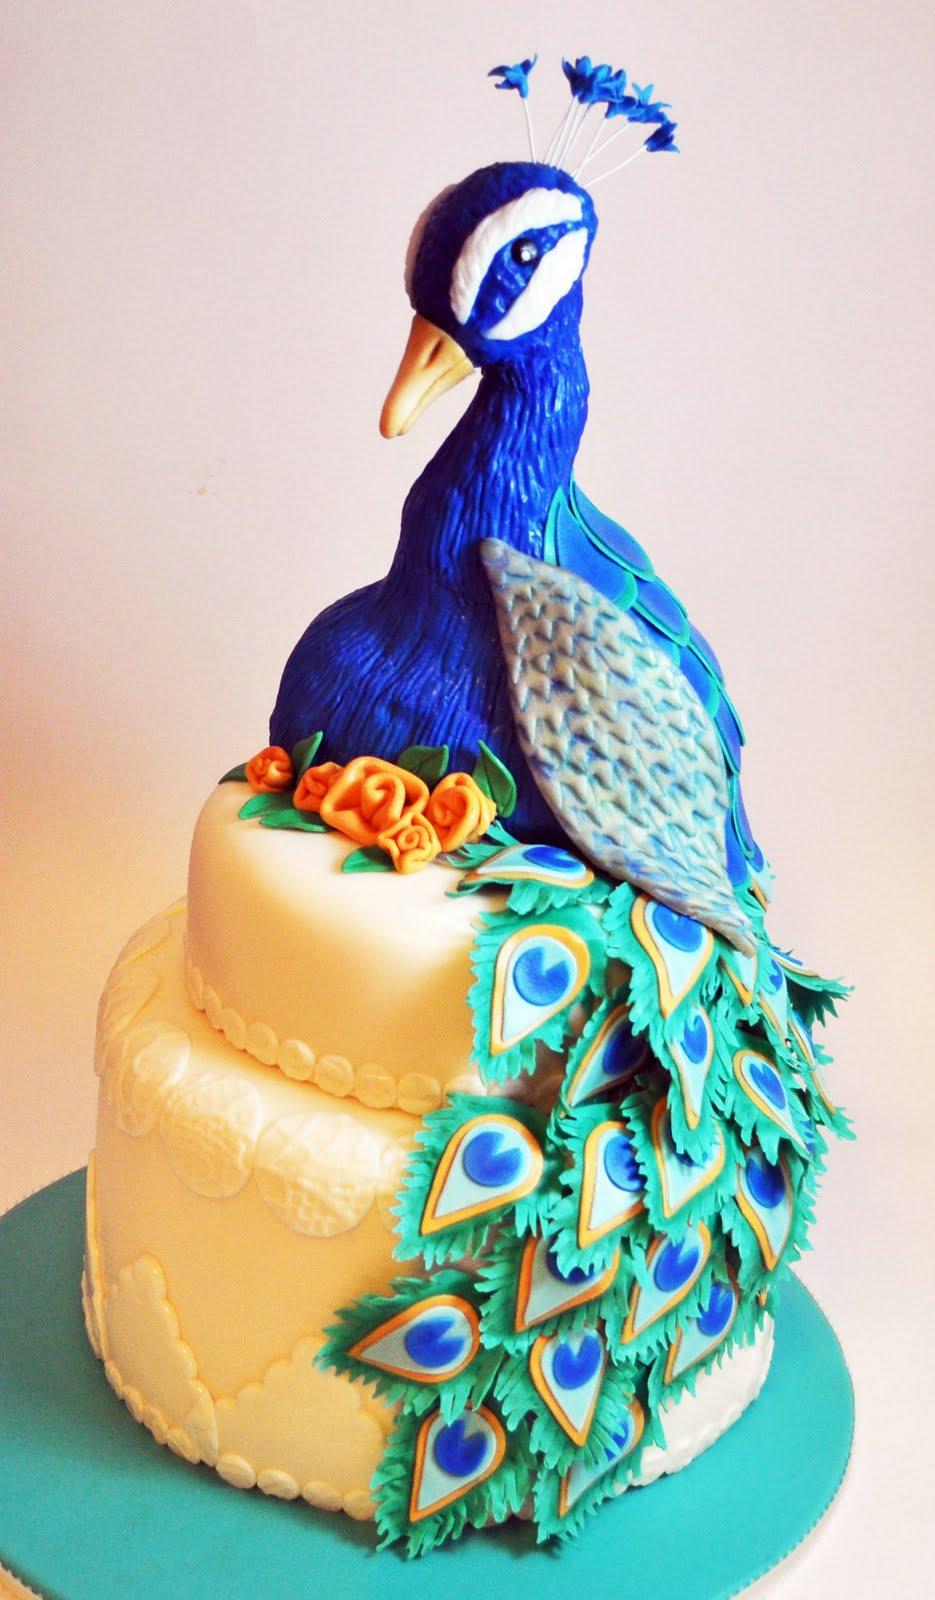 Peacock Cakes Decoration Ideas